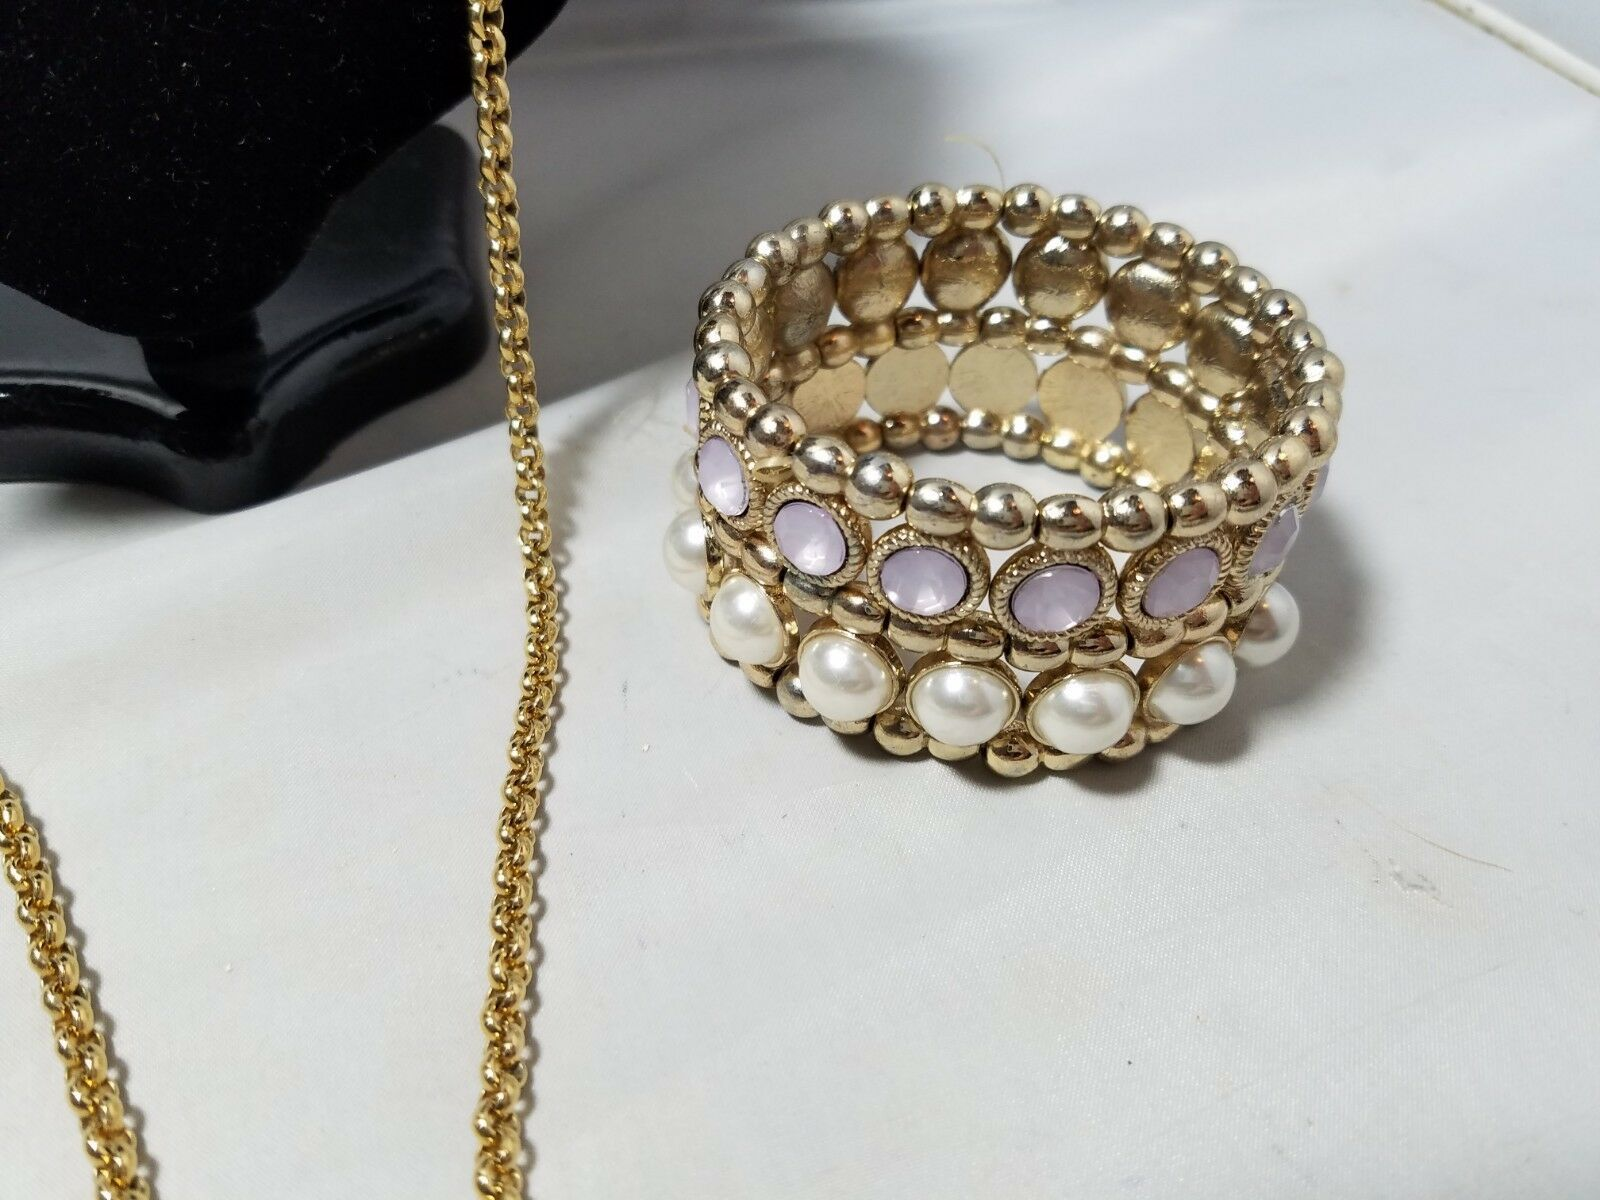 Vintage Fashion Jewelry Set Gold Tone Faux Pearl Necklace Pendant Bracelet & Ear